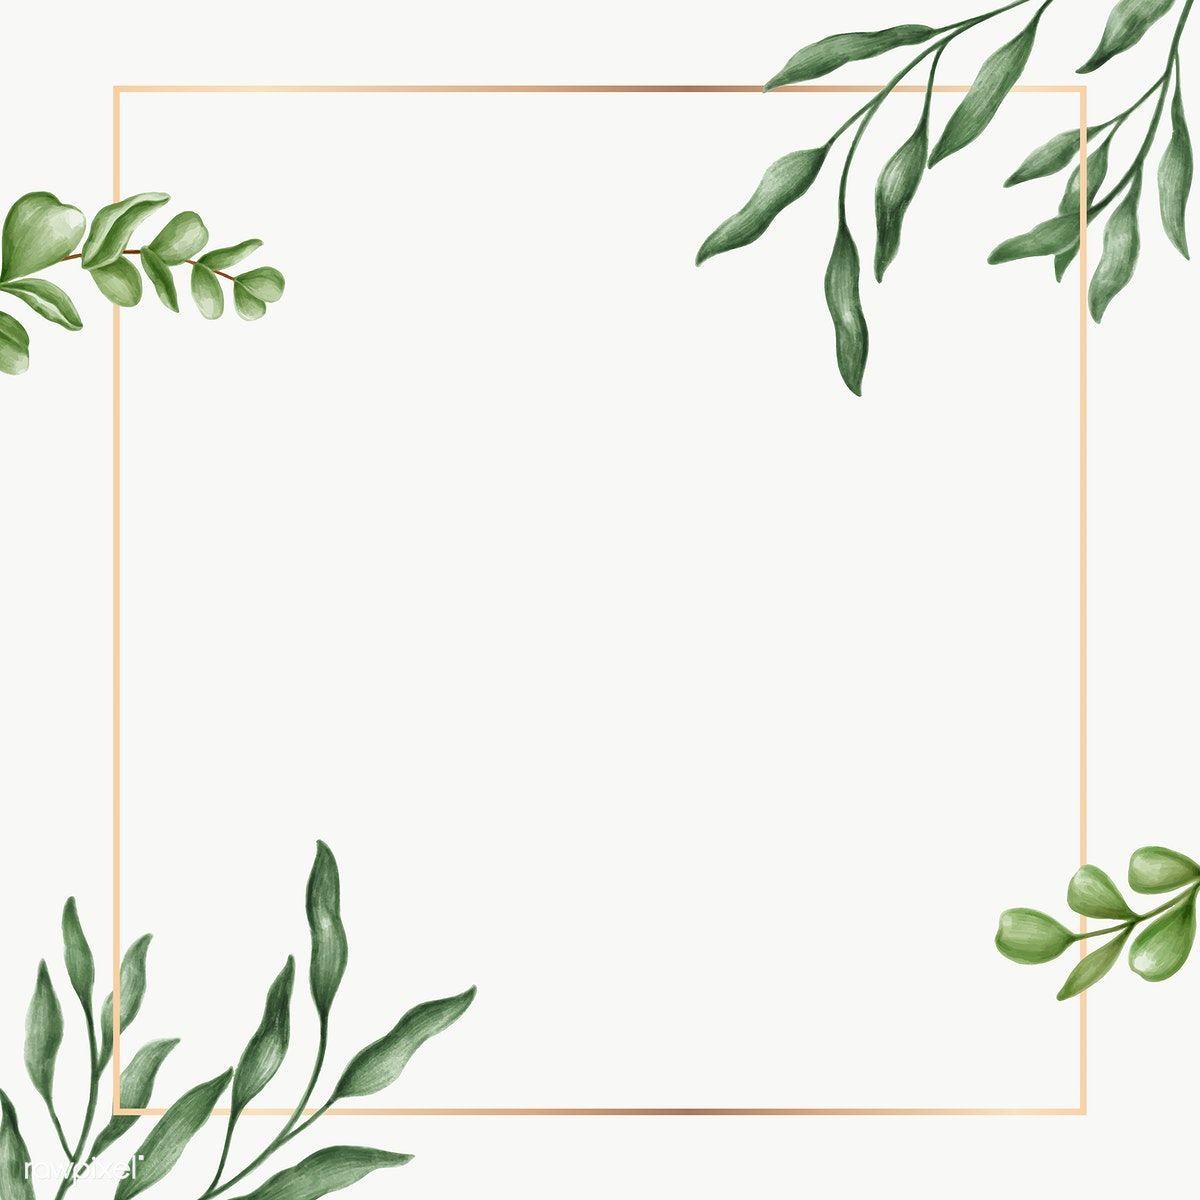 Green Leaves Frame Transparent Png Premium Image By Rawpixel Com Noon Vector Vectorart Digita Green Leaf Background Leaf Background Floral Border Design